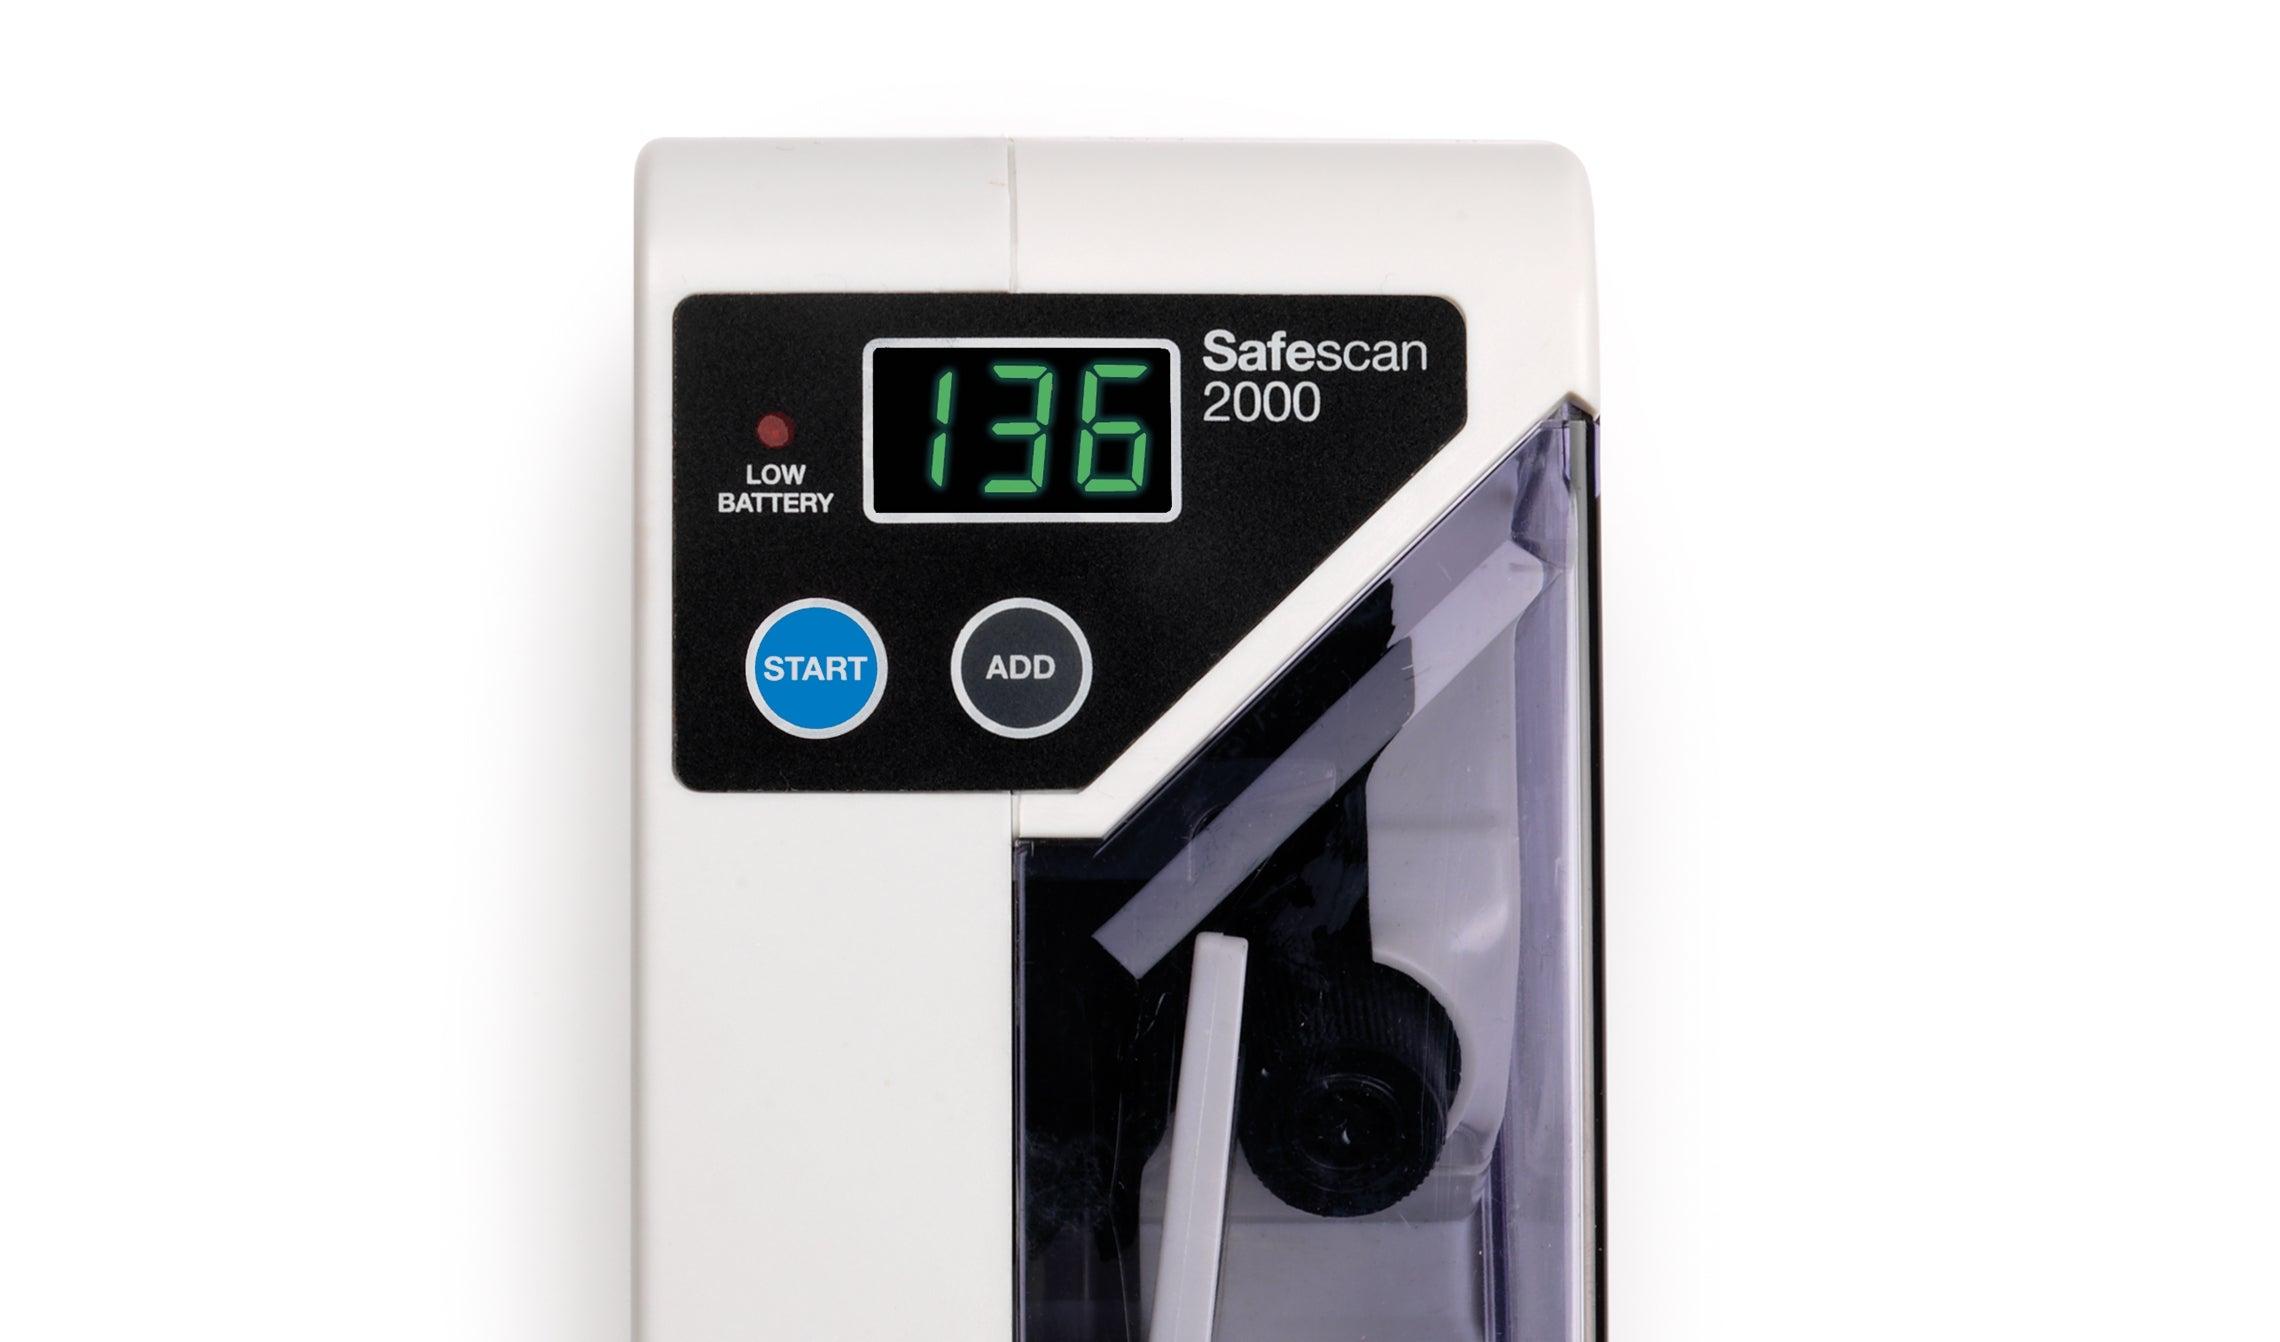 safescan-2000-display